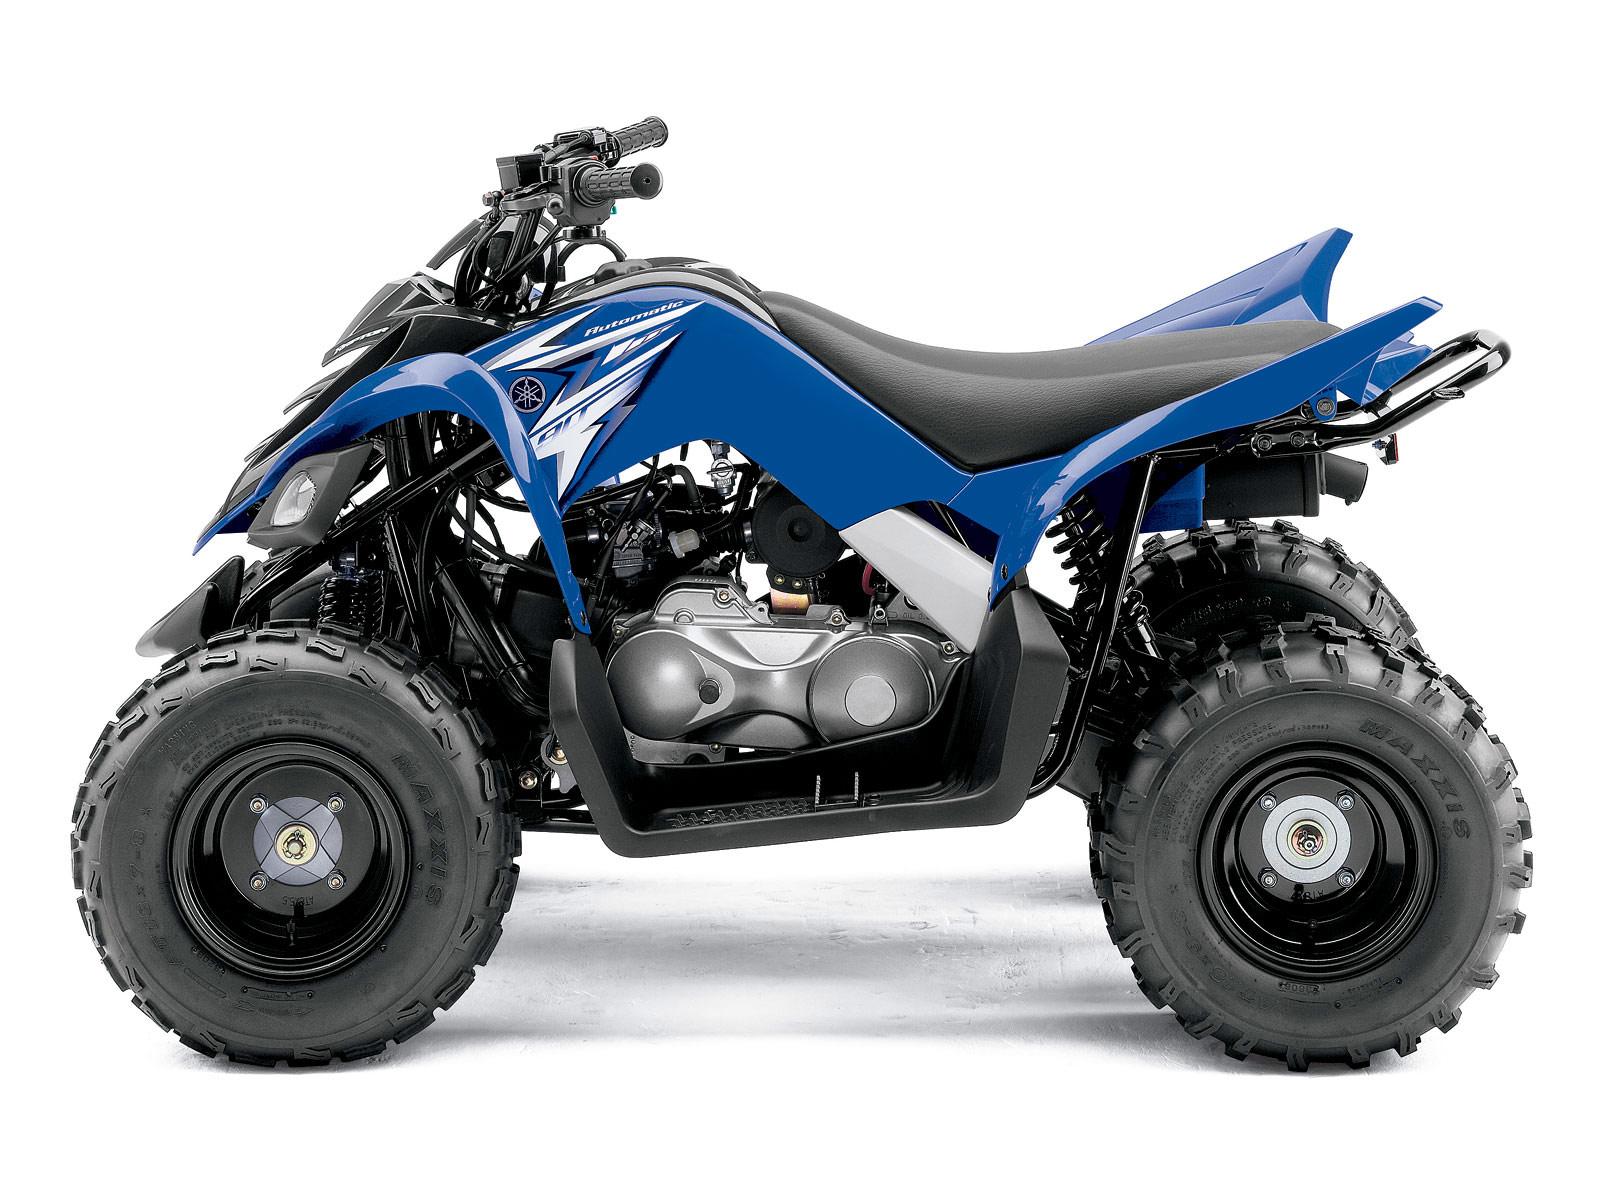 Yamaha Kids Atv >> 2011 YAMAHA Raptor 90 pictures, specs   ATV accident lawyers